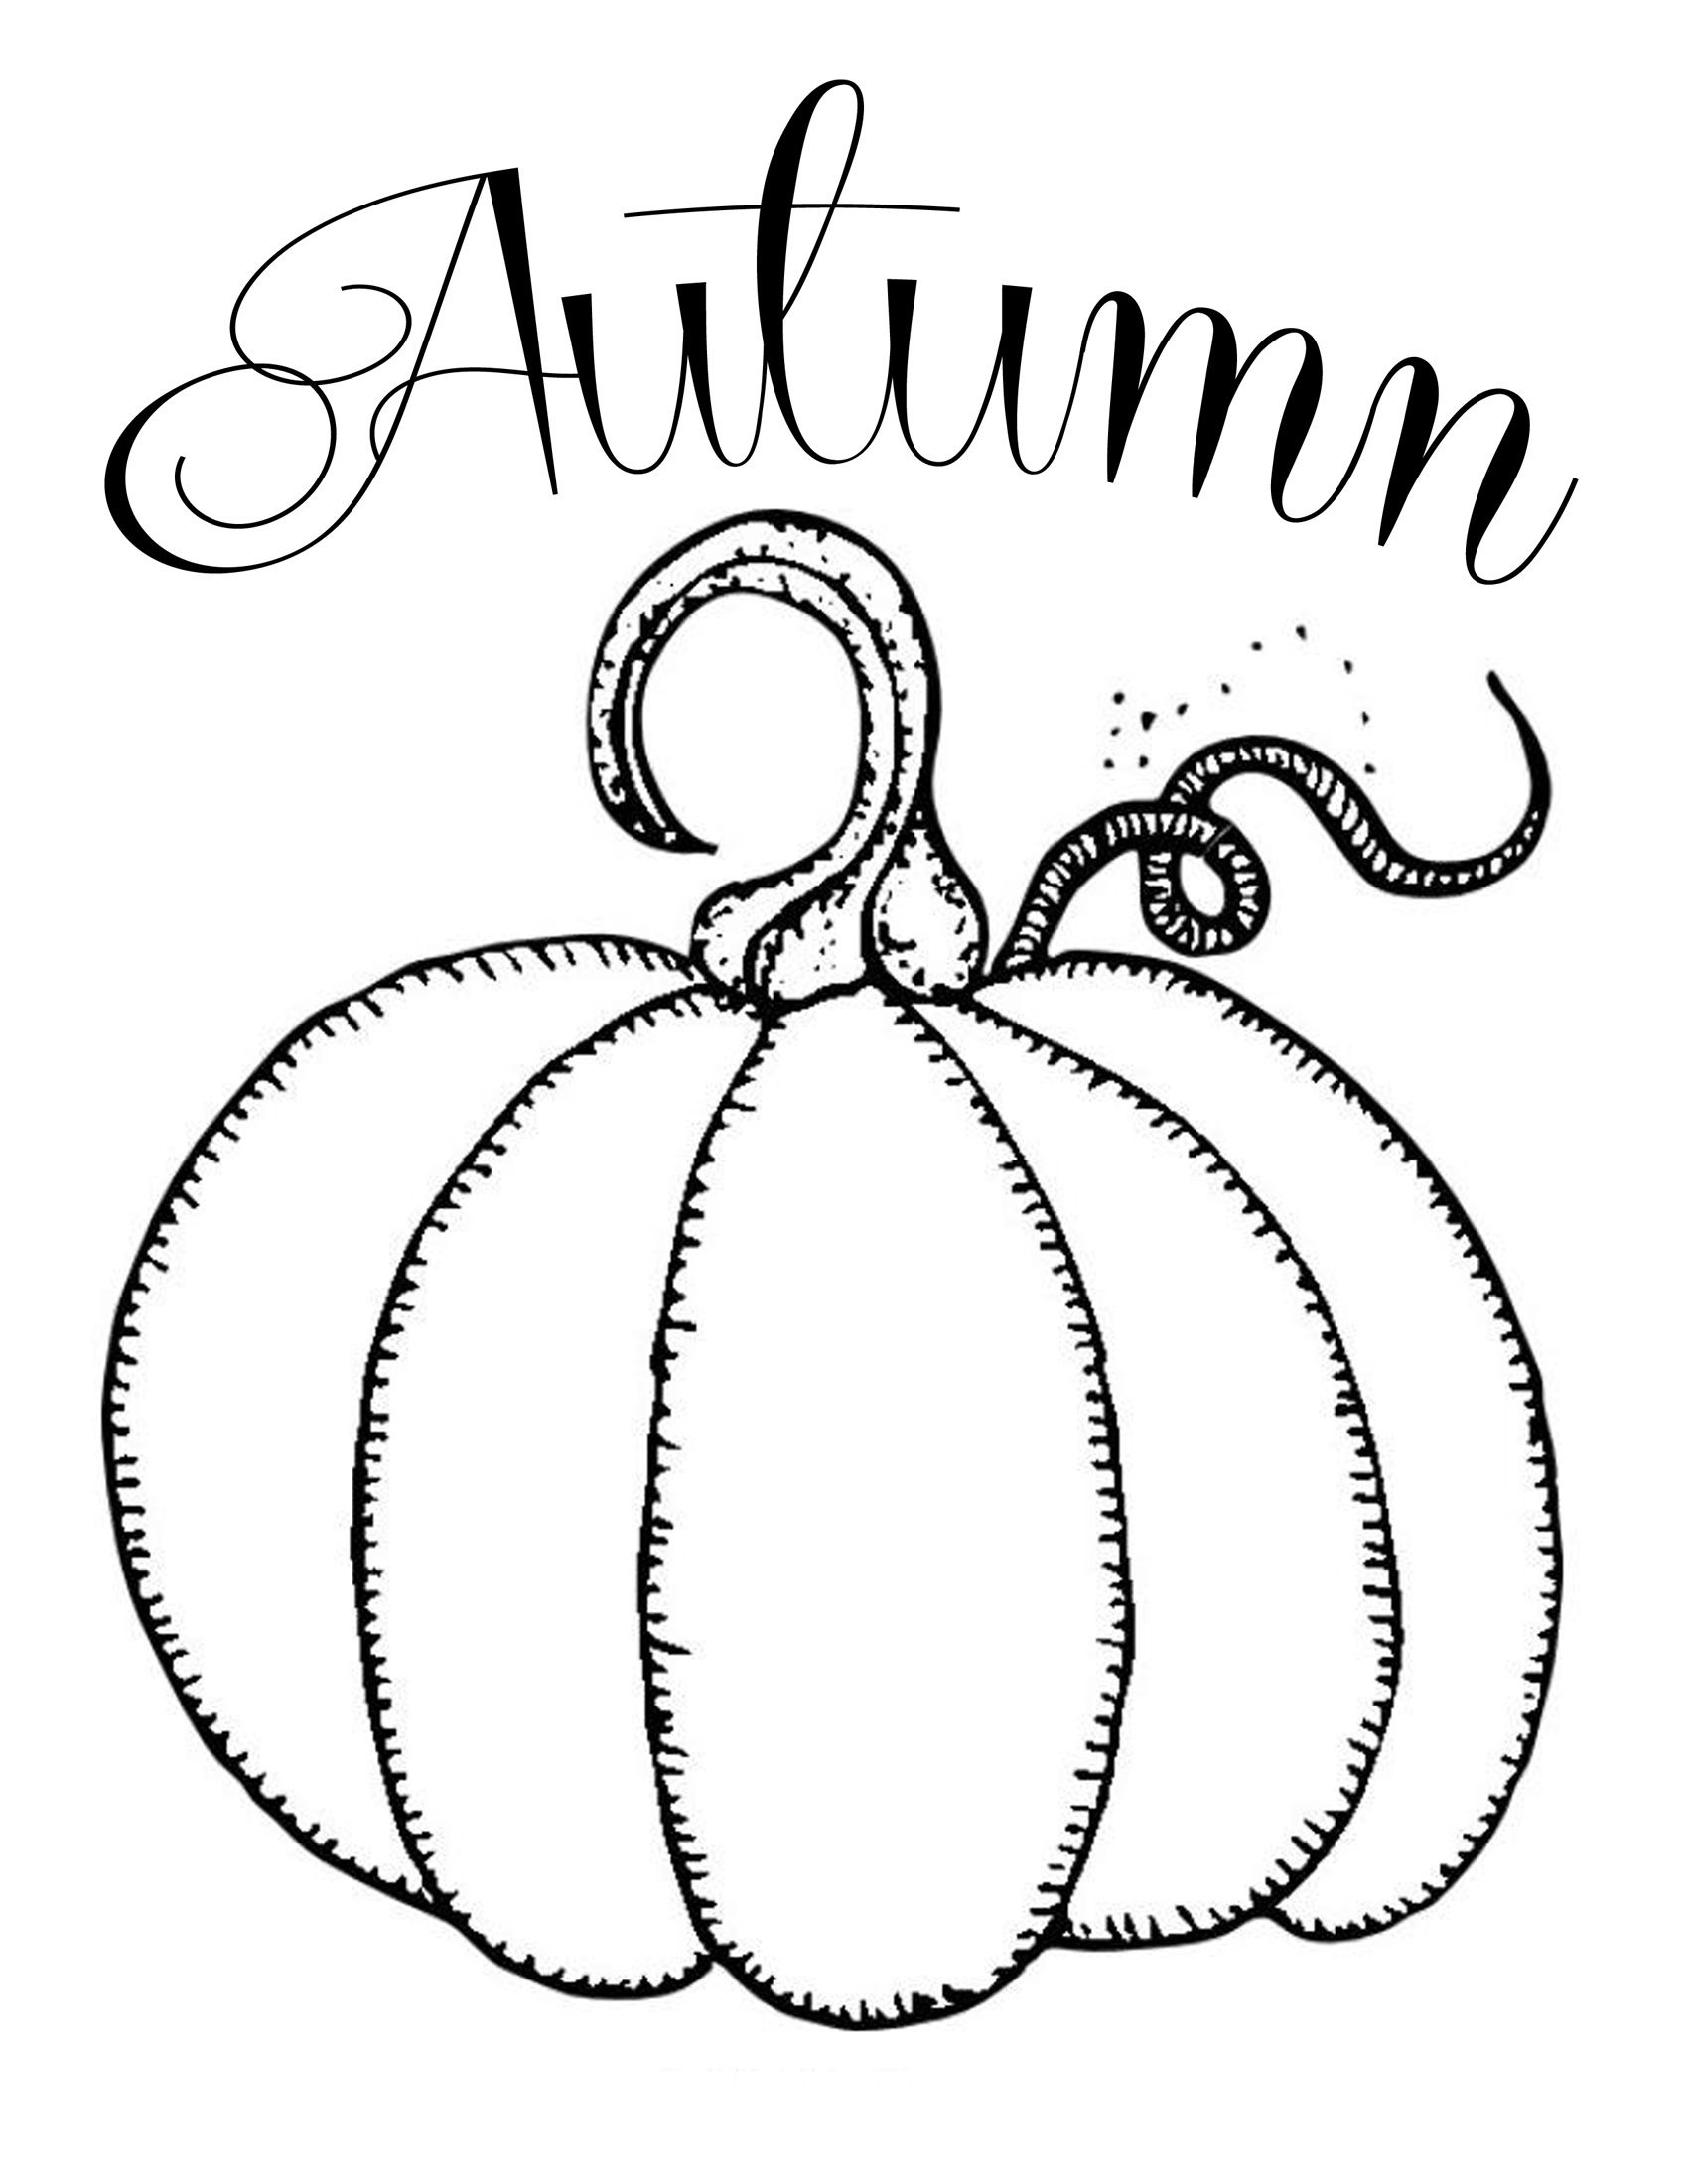 Free Printables ~ Chalkboard Autumn Pumpkin | Fonts And Printables - Free Printable Fall Coloring Pages